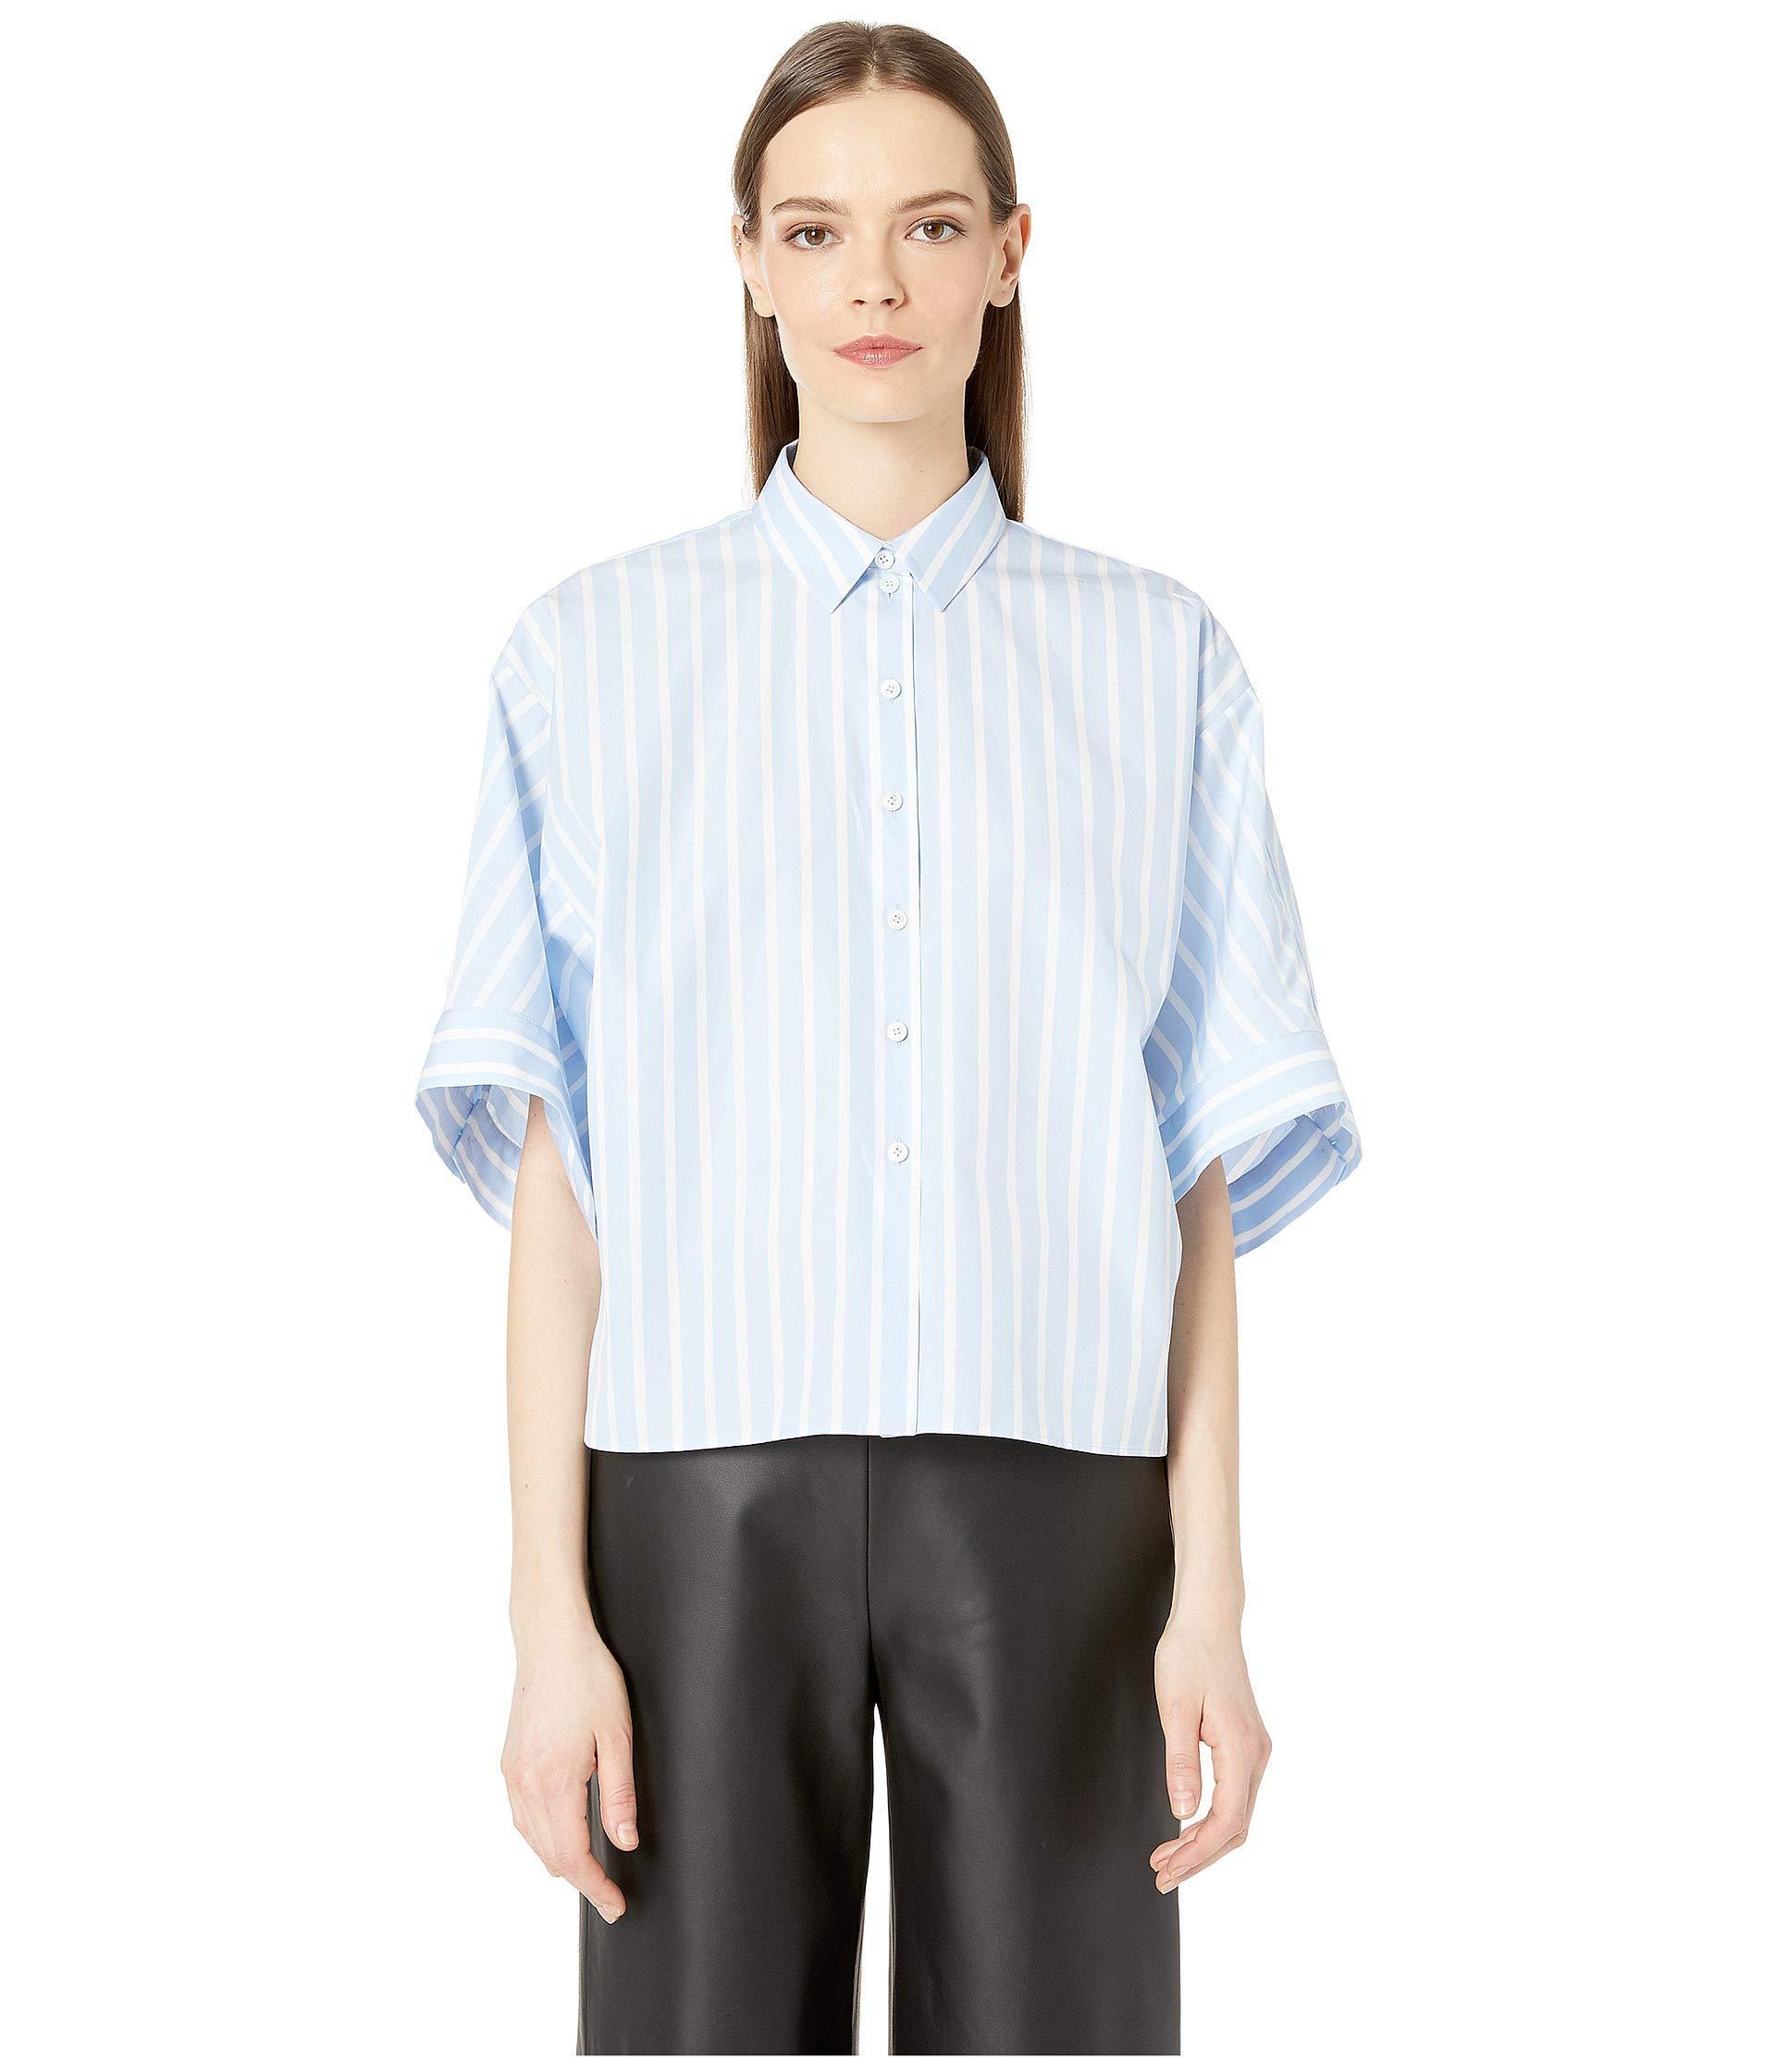 a963bce8 Lyst - Jil Sander Navy Woven Shirt (blue/white) Women's Clothing in Blue